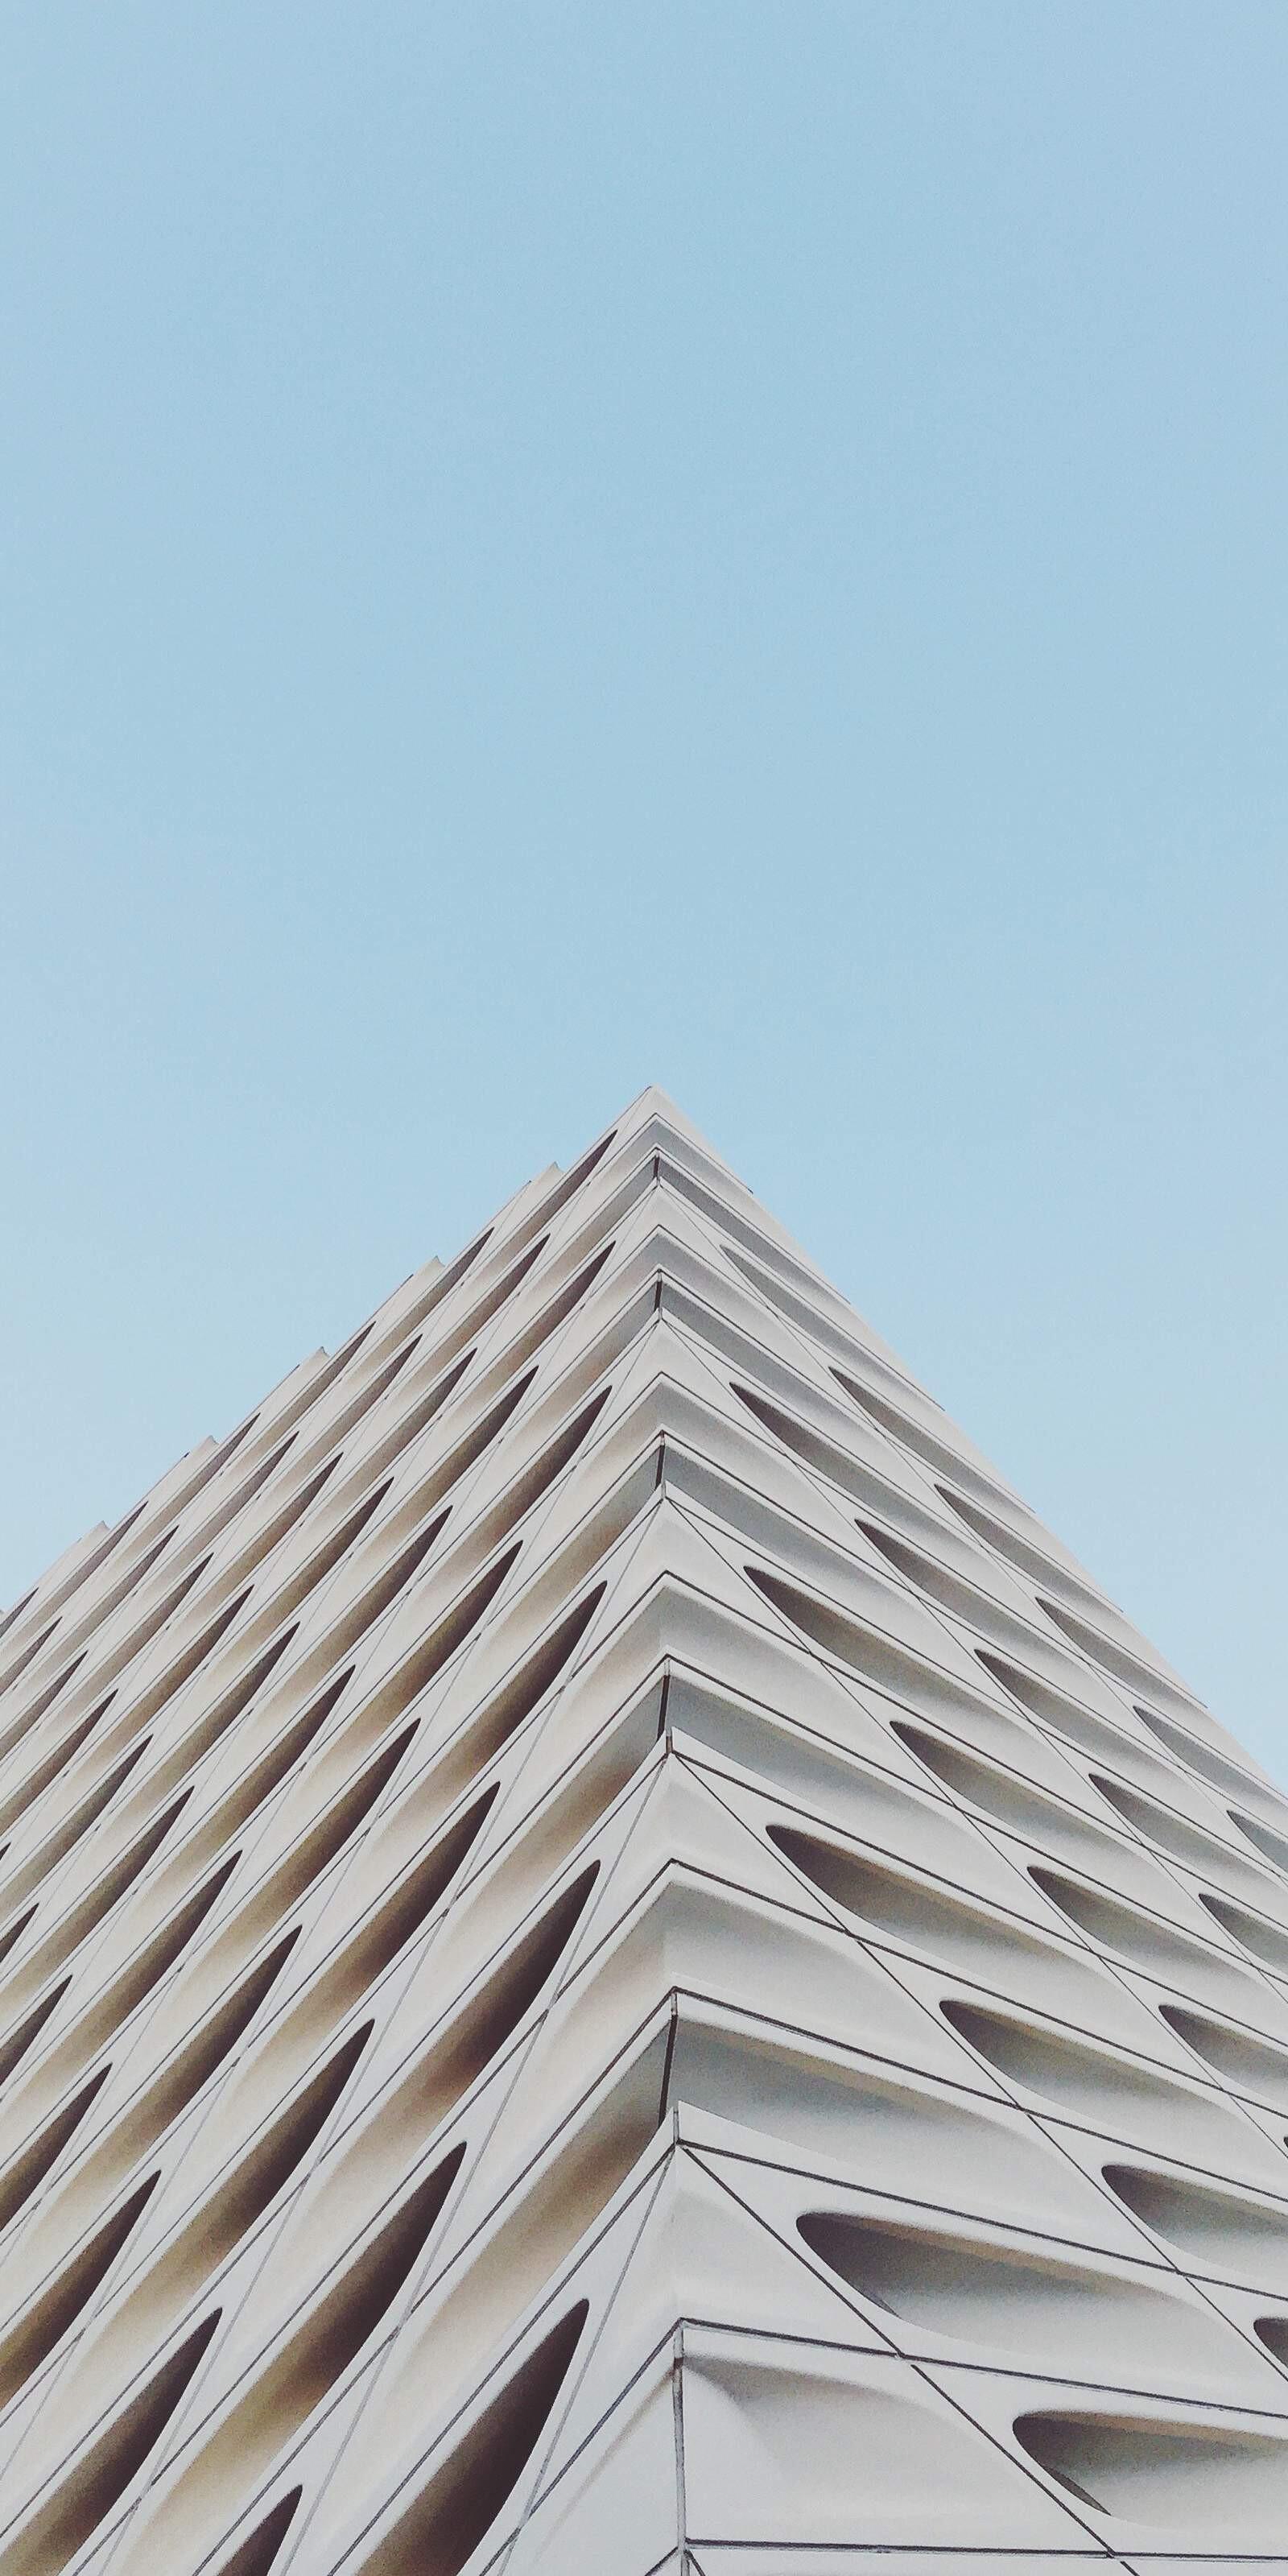 18 9 wallpapers for bezel less smartphones for Wallpaper for less